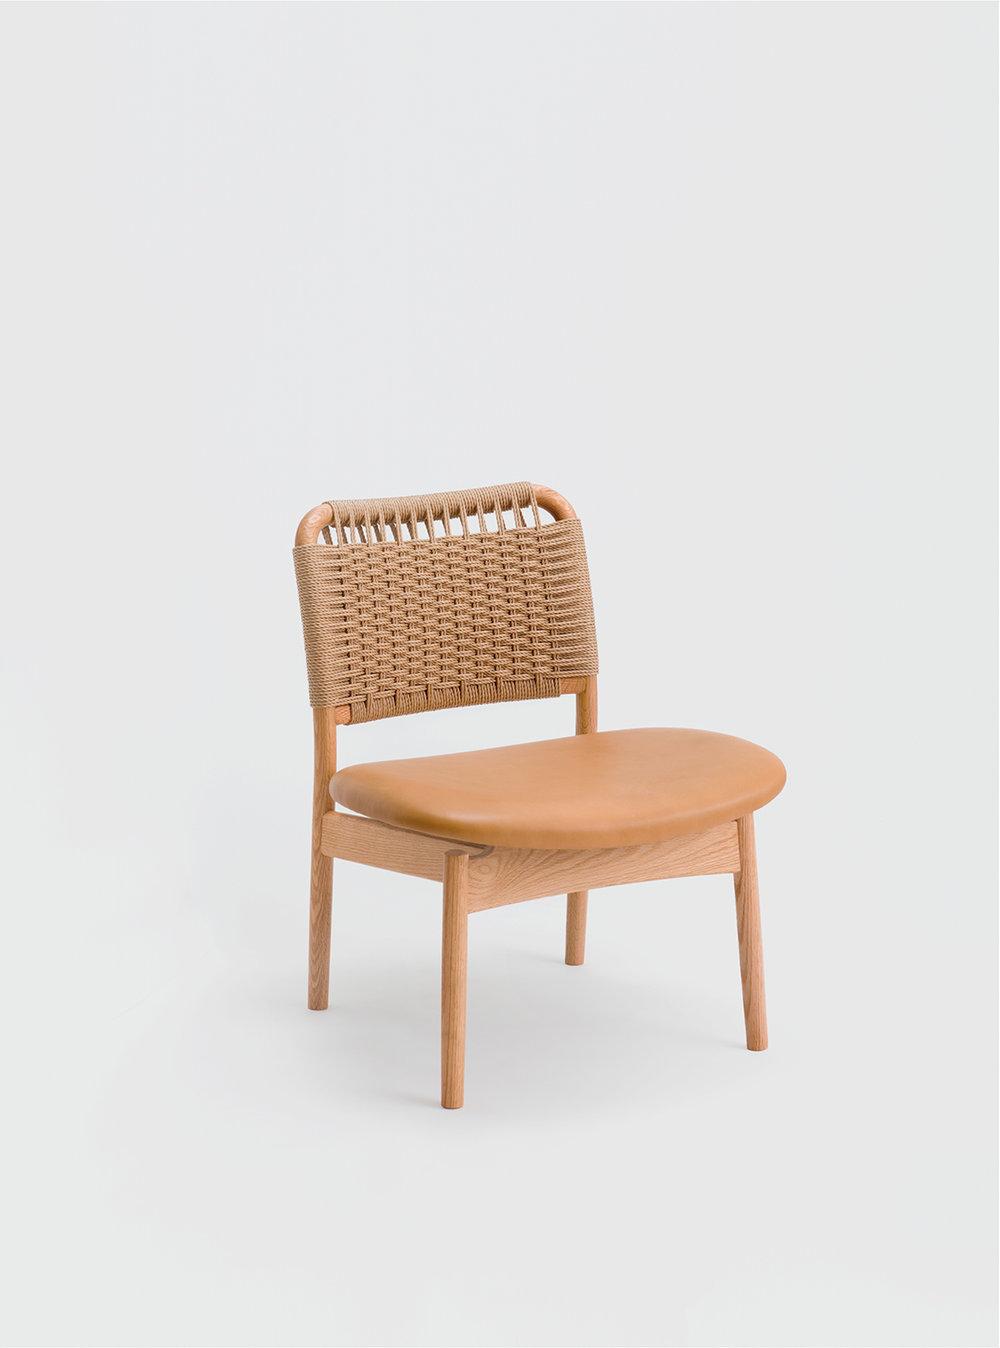 Ariake Saga Low Chair - Oak/Leather Seat